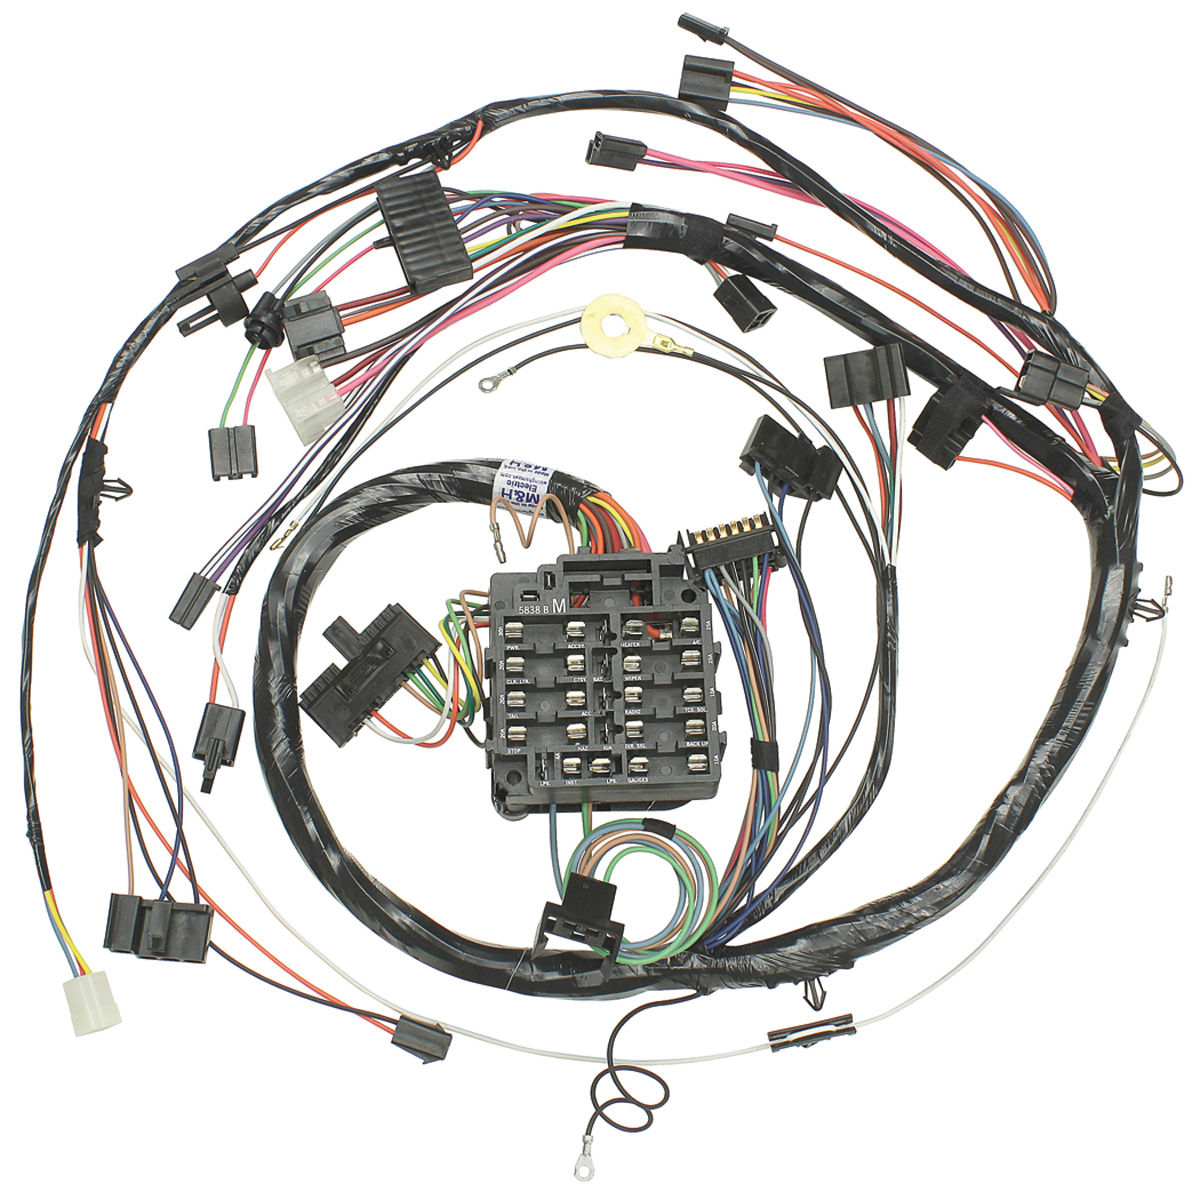 [DIAGRAM_5NL]  Wiring Harness, Dash, 1972 Chevelle/El Camino/Monte, Round SS Gauges @  OPGI.com | Fuse Box Diagram Wiring Harness 1972 |  | OPGI.com